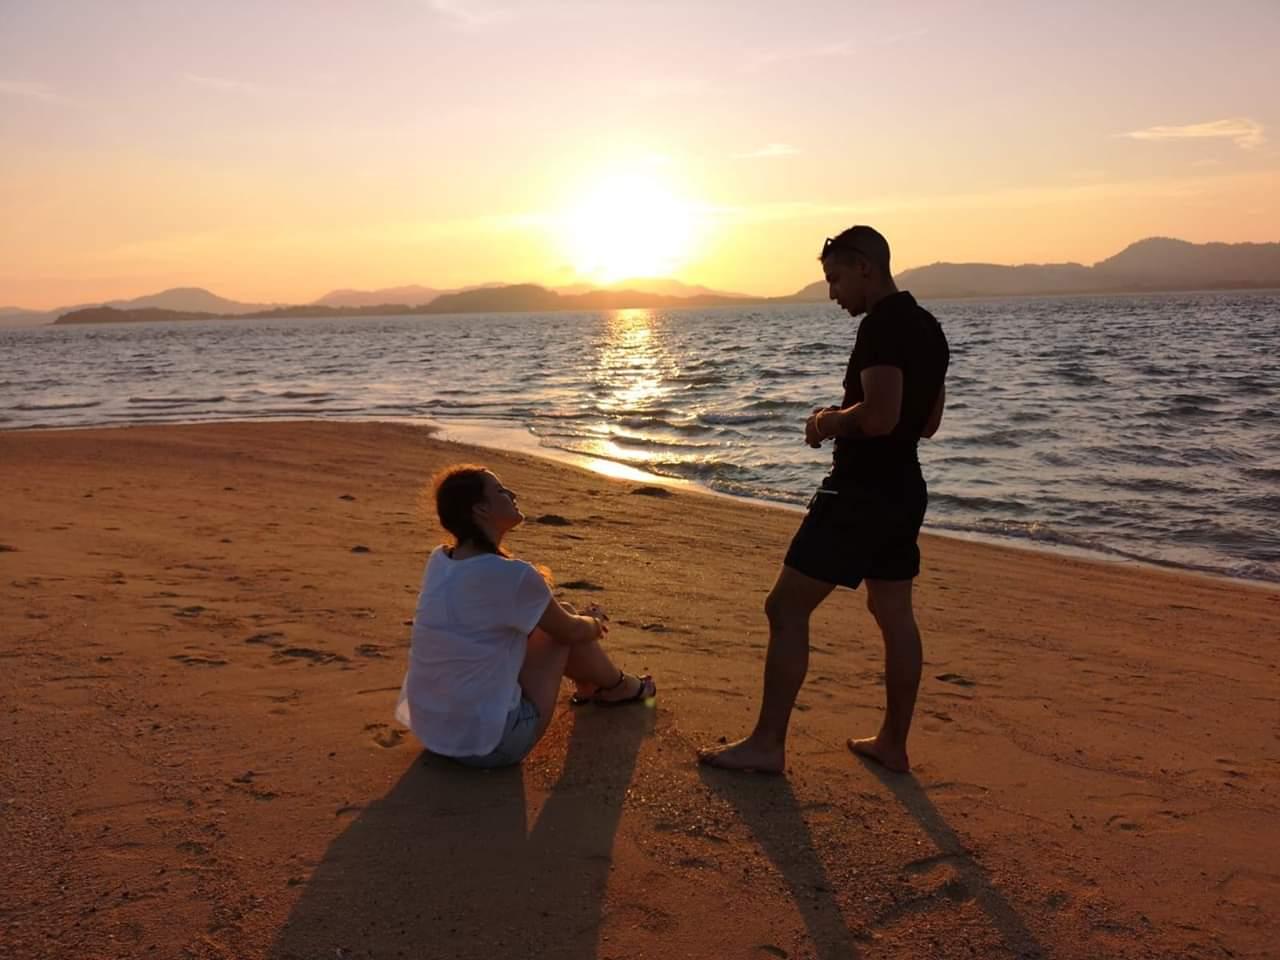 🔝James Bond Isla Phang Nga Bay Exclusive🚤Incluyendo el Atardecer 🌅